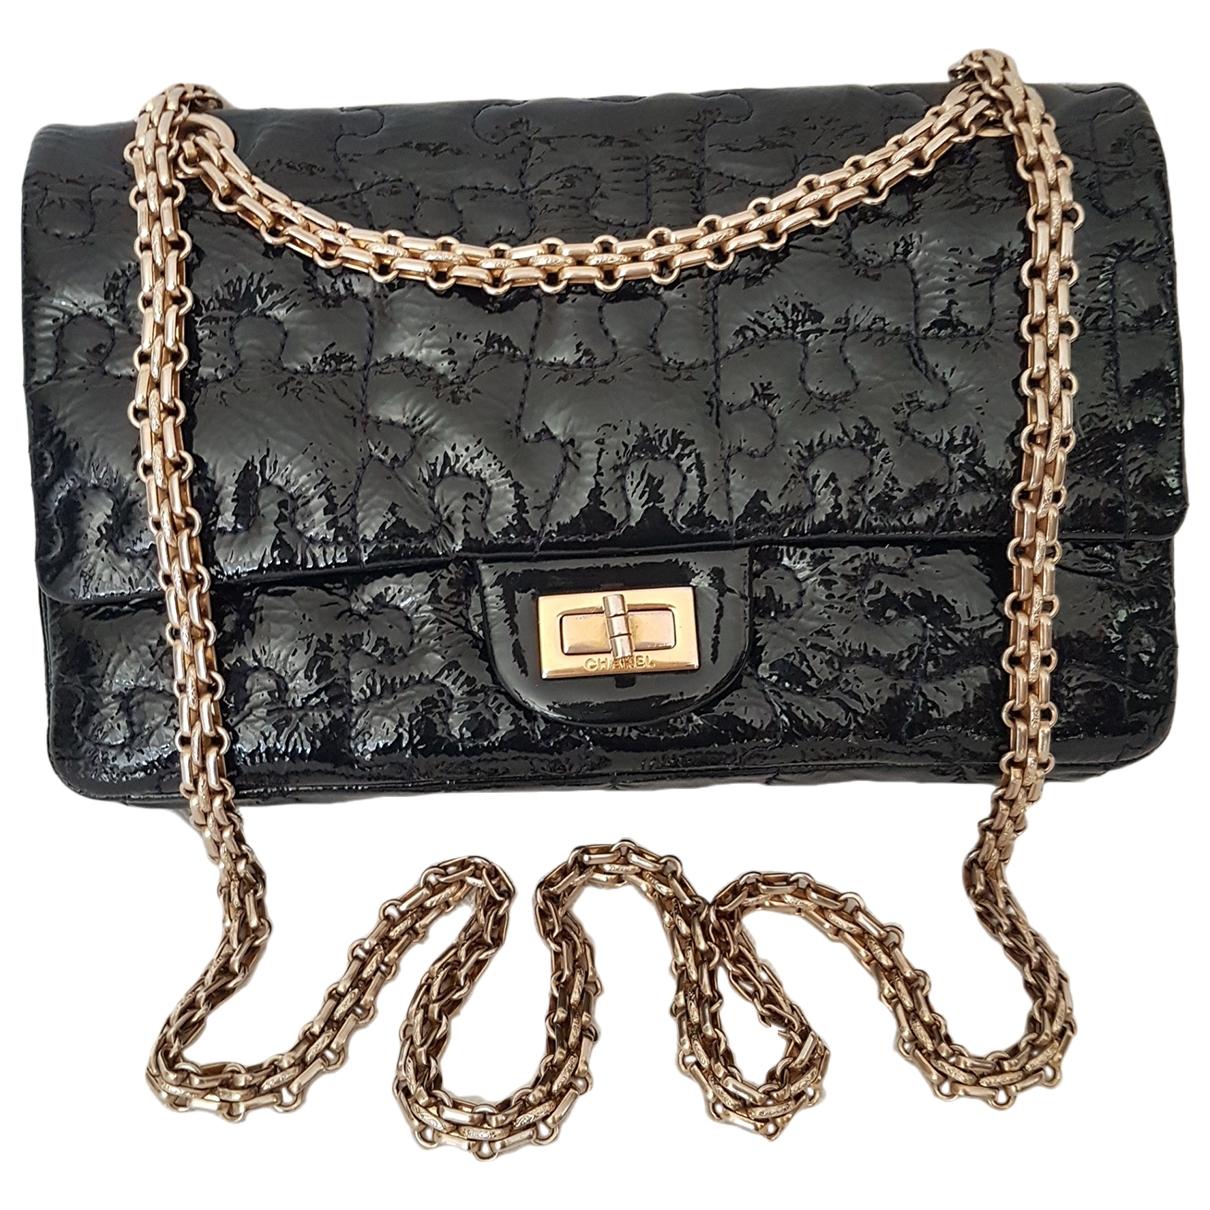 Chanel 2.55 Navy Patent leather handbag for Women \N